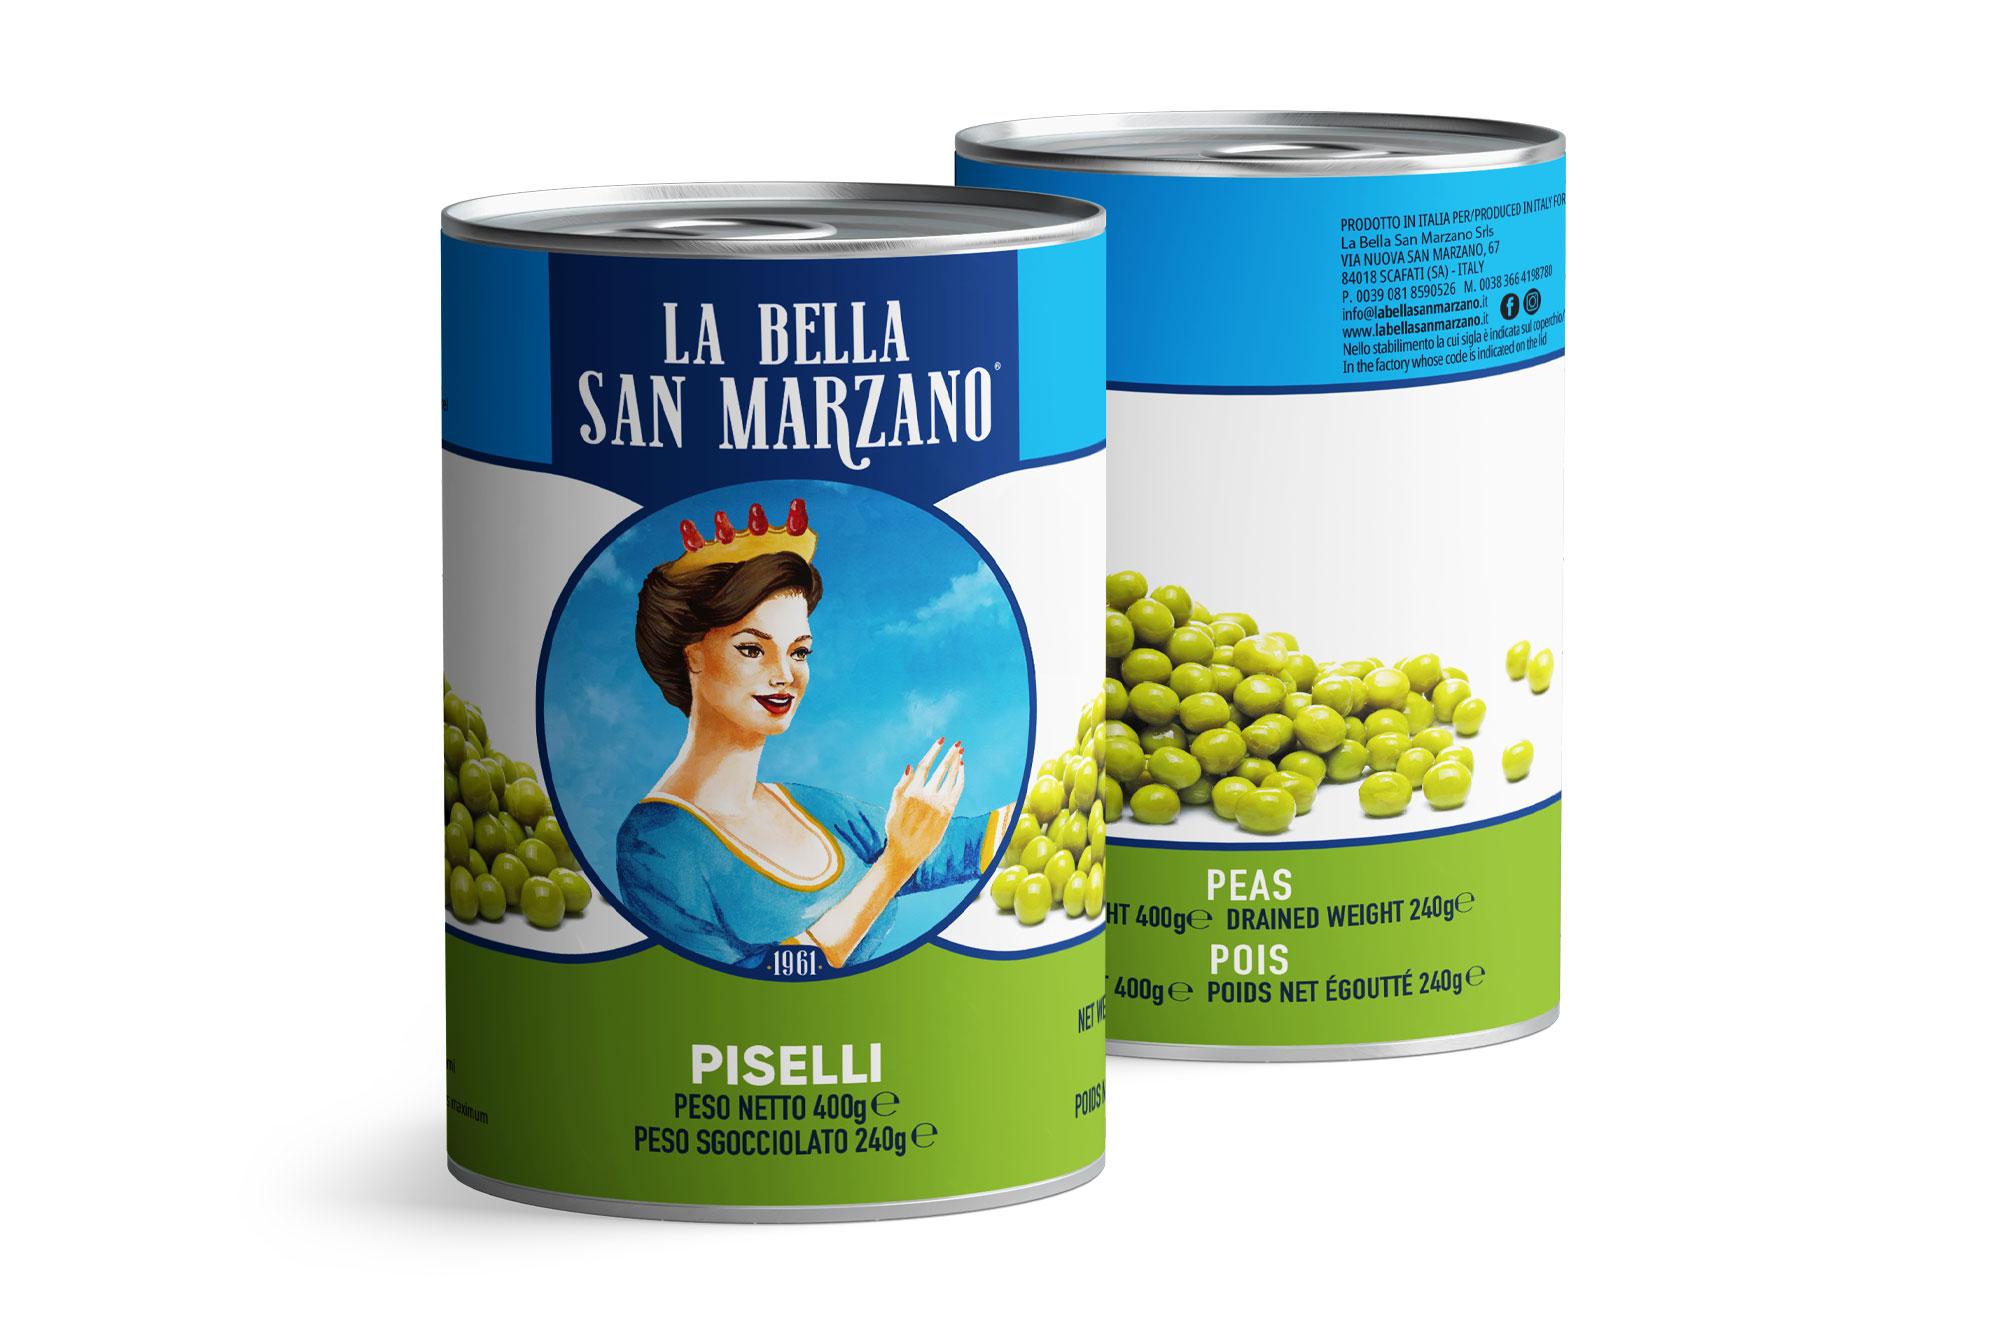 La Bella San Marzano - Piselli 400 gr